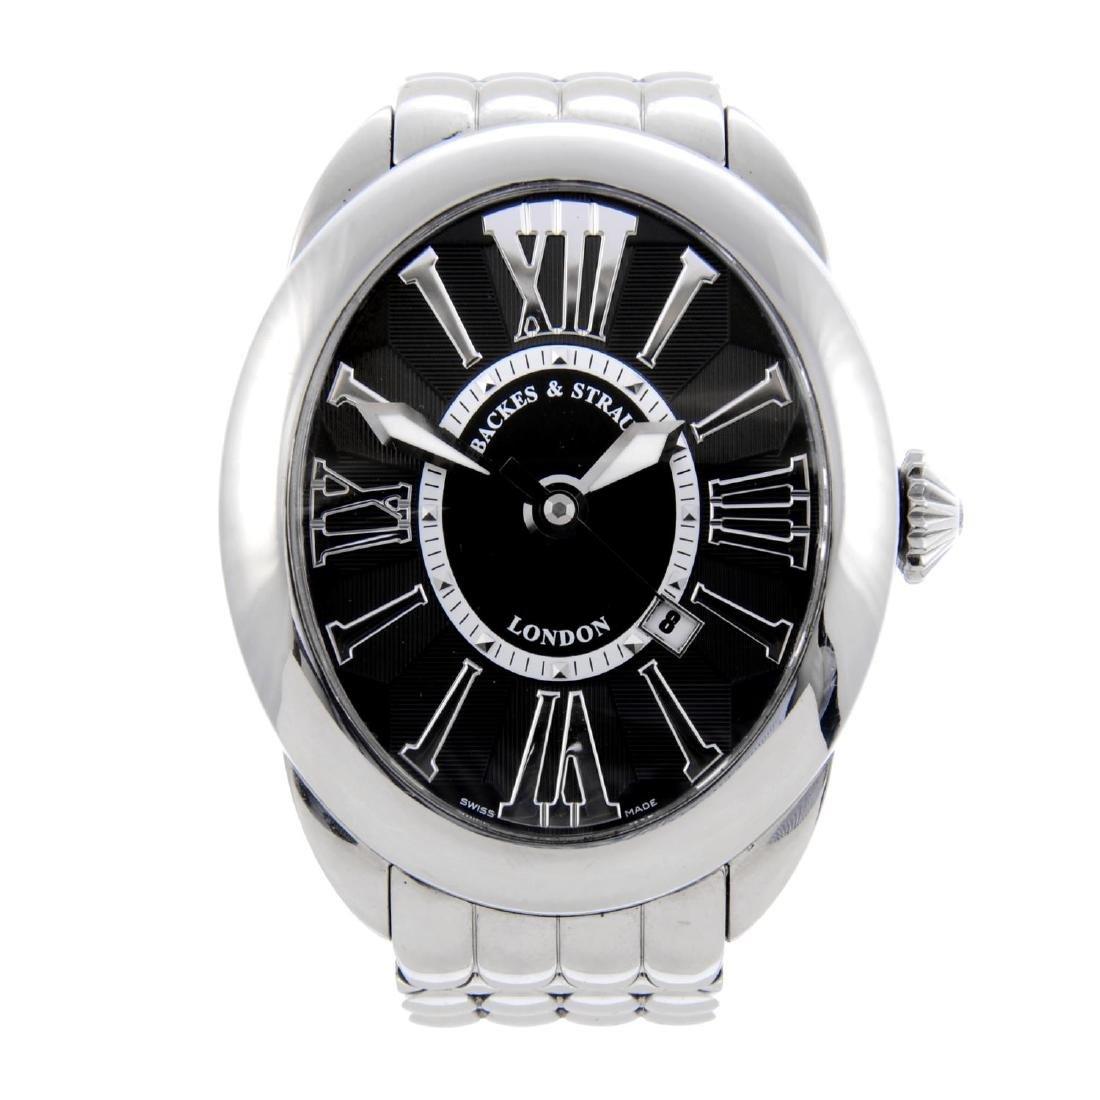 BACKES & STRAUSS - a gentleman's Regent bracelet watch.